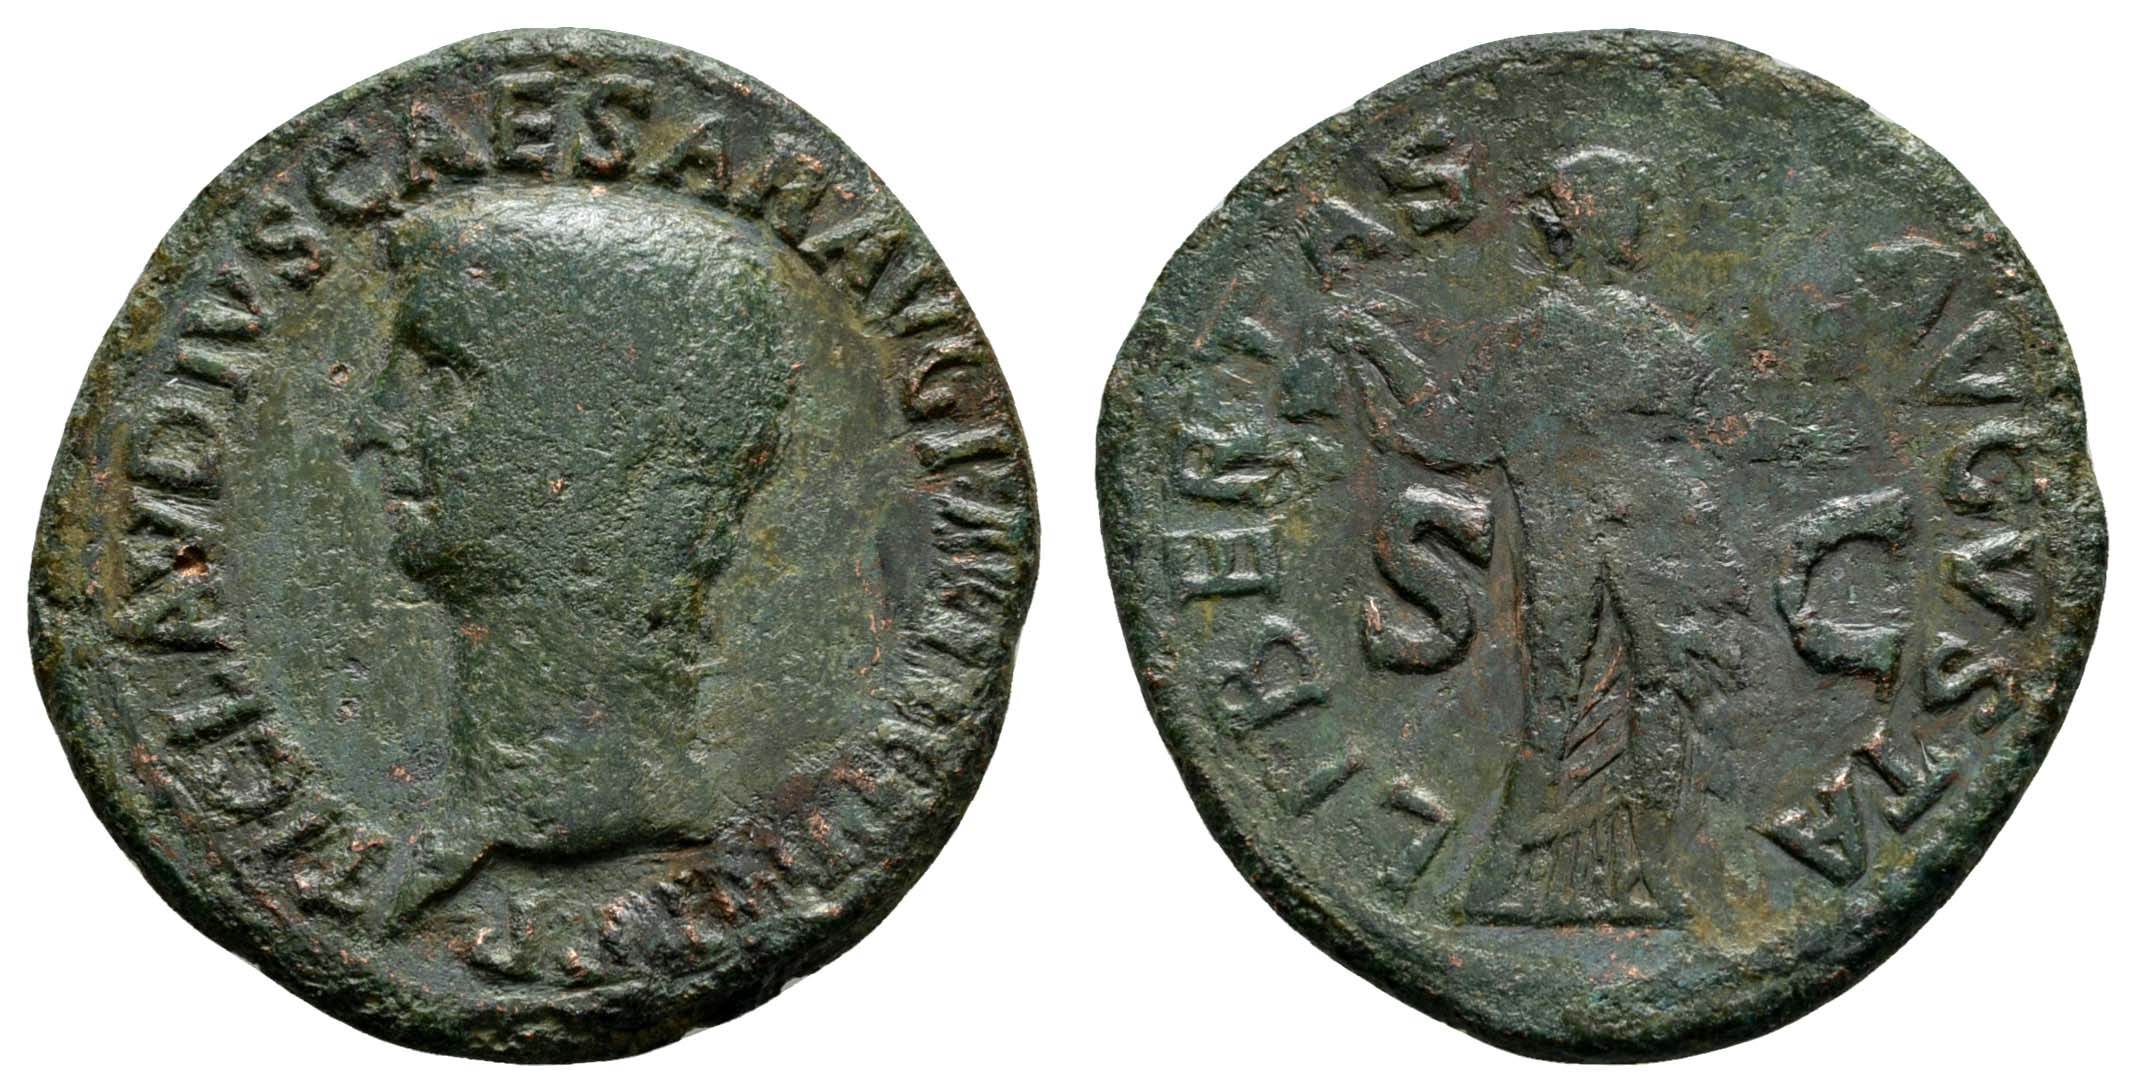 Lot 135 - Antike Römer - Kaiserzeit -  Auktionshaus Ulrich Felzmann GmbH & Co. KG Coins single lots